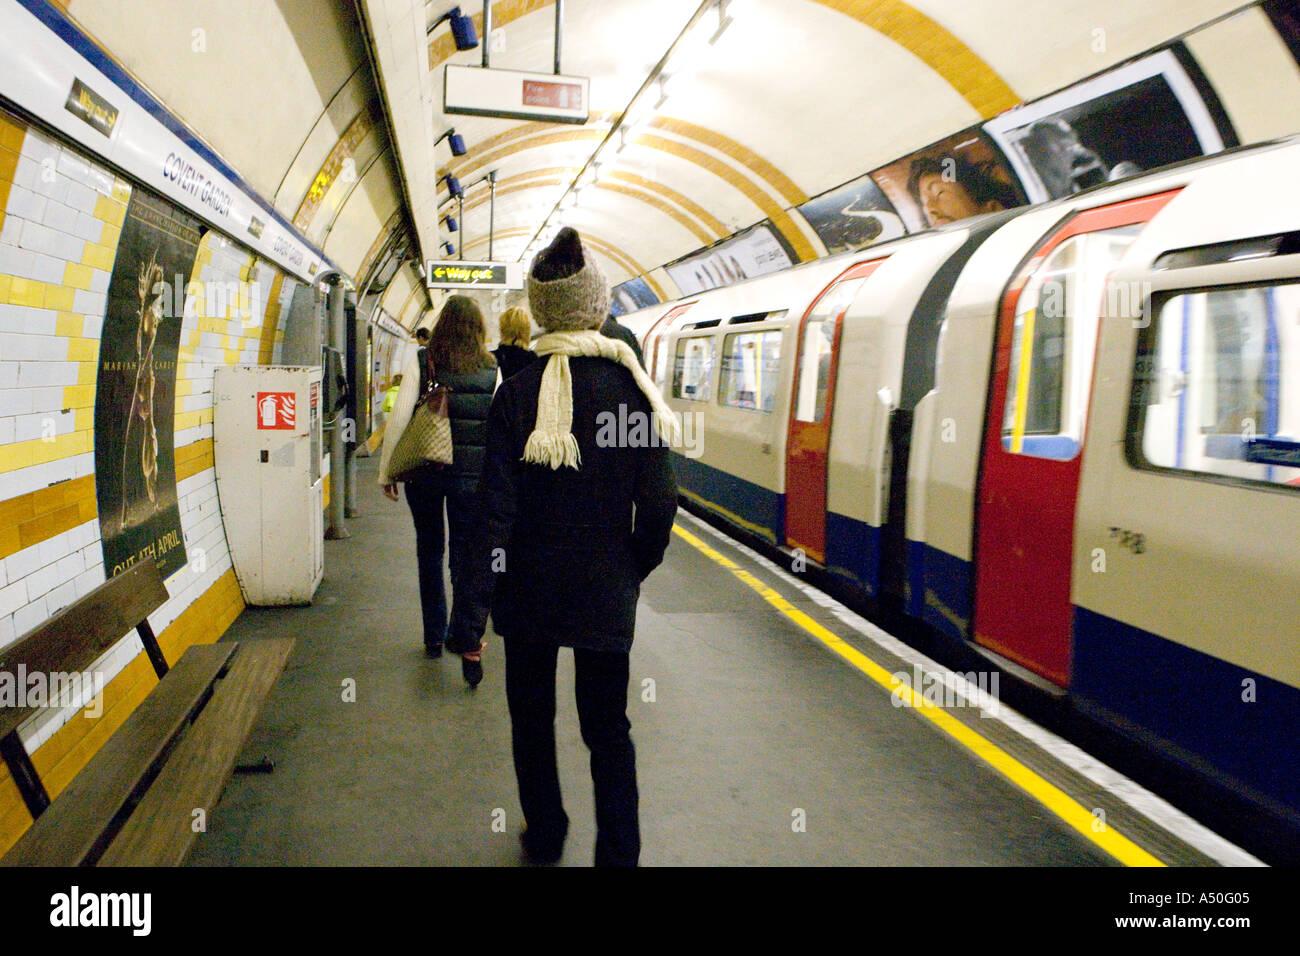 Tube train platform and commuters London England - Stock Image